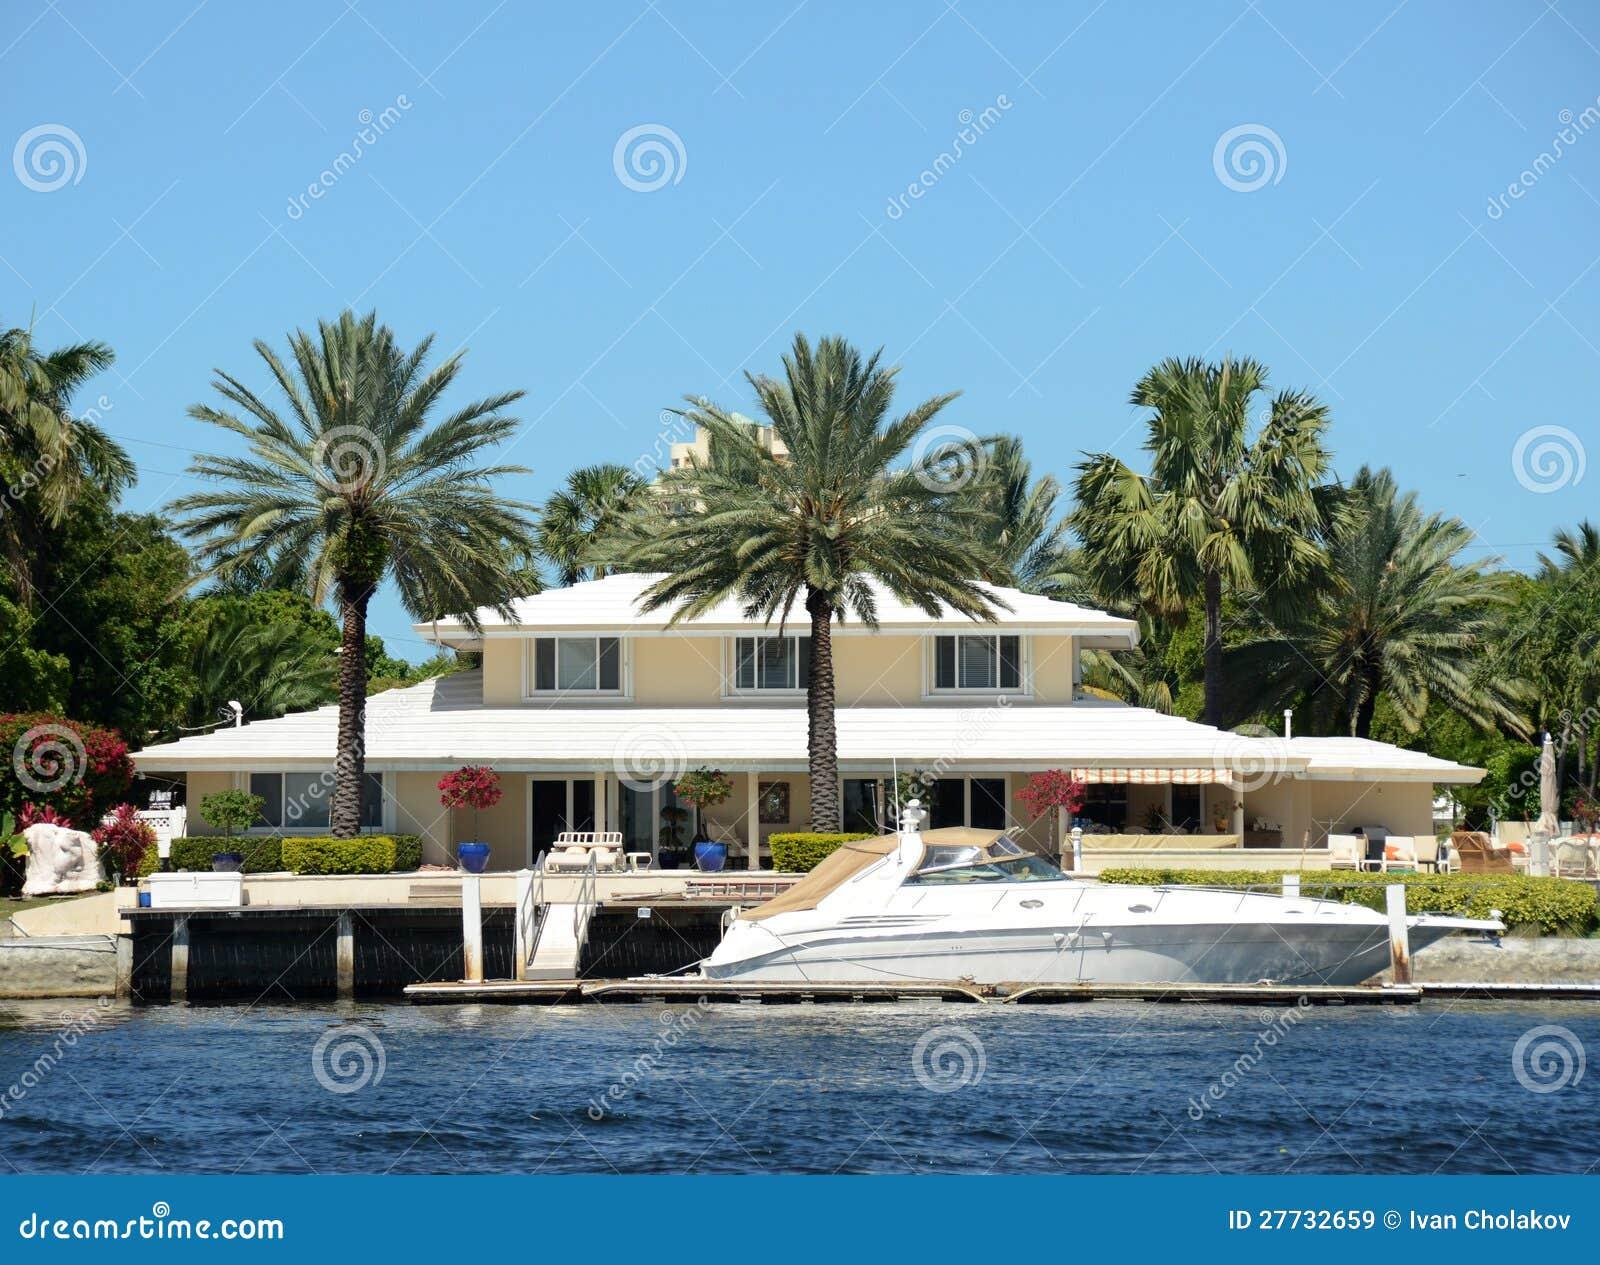 Maison de luxe de bord de mer images libres de droits - Maison en bord de mer ...